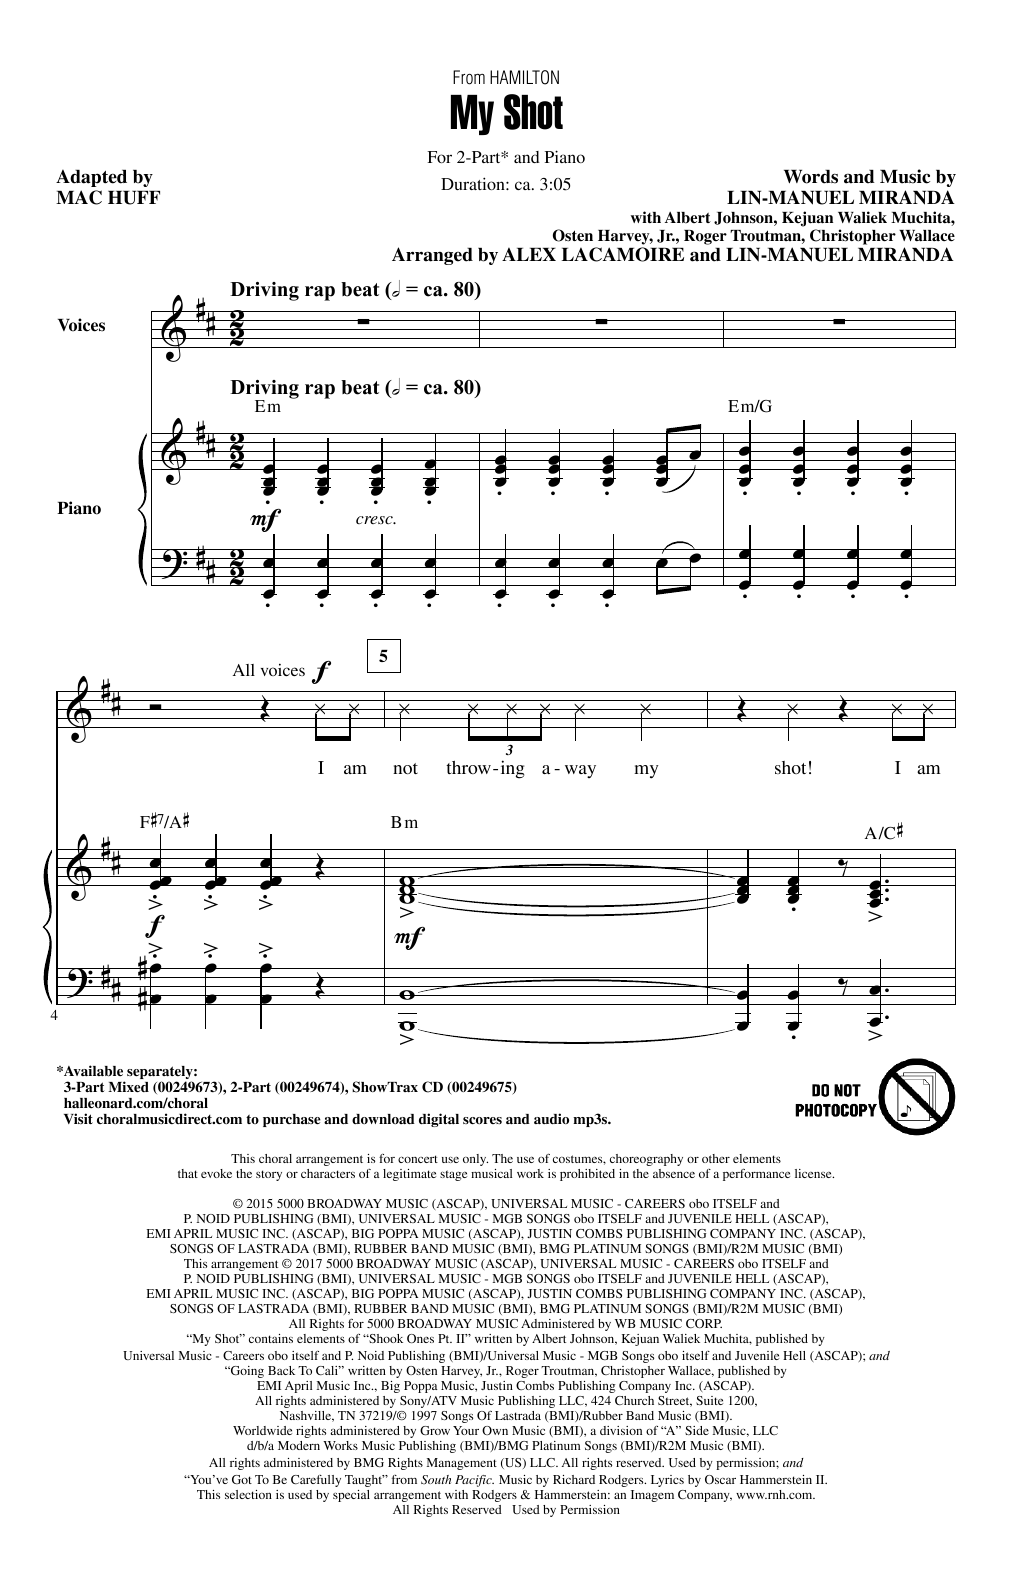 Lin-Manuel Miranda My Shot (from Hamilton) (arr. Mac Huff) sheet music notes and chords. Download Printable PDF.